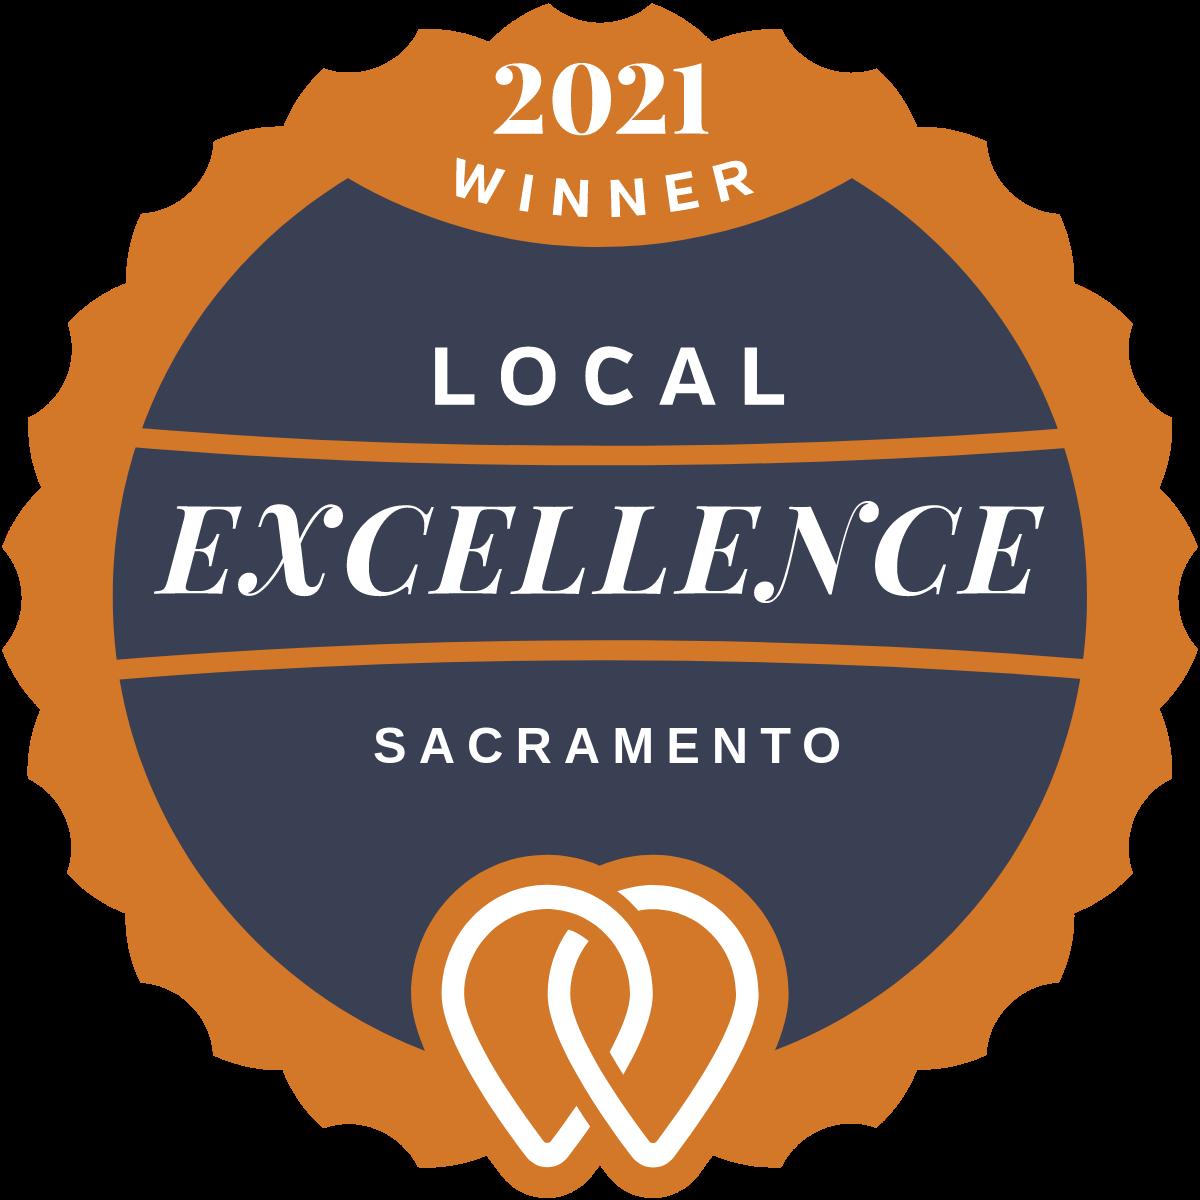 2021 Local Excellence Winner in Sacramento, CA